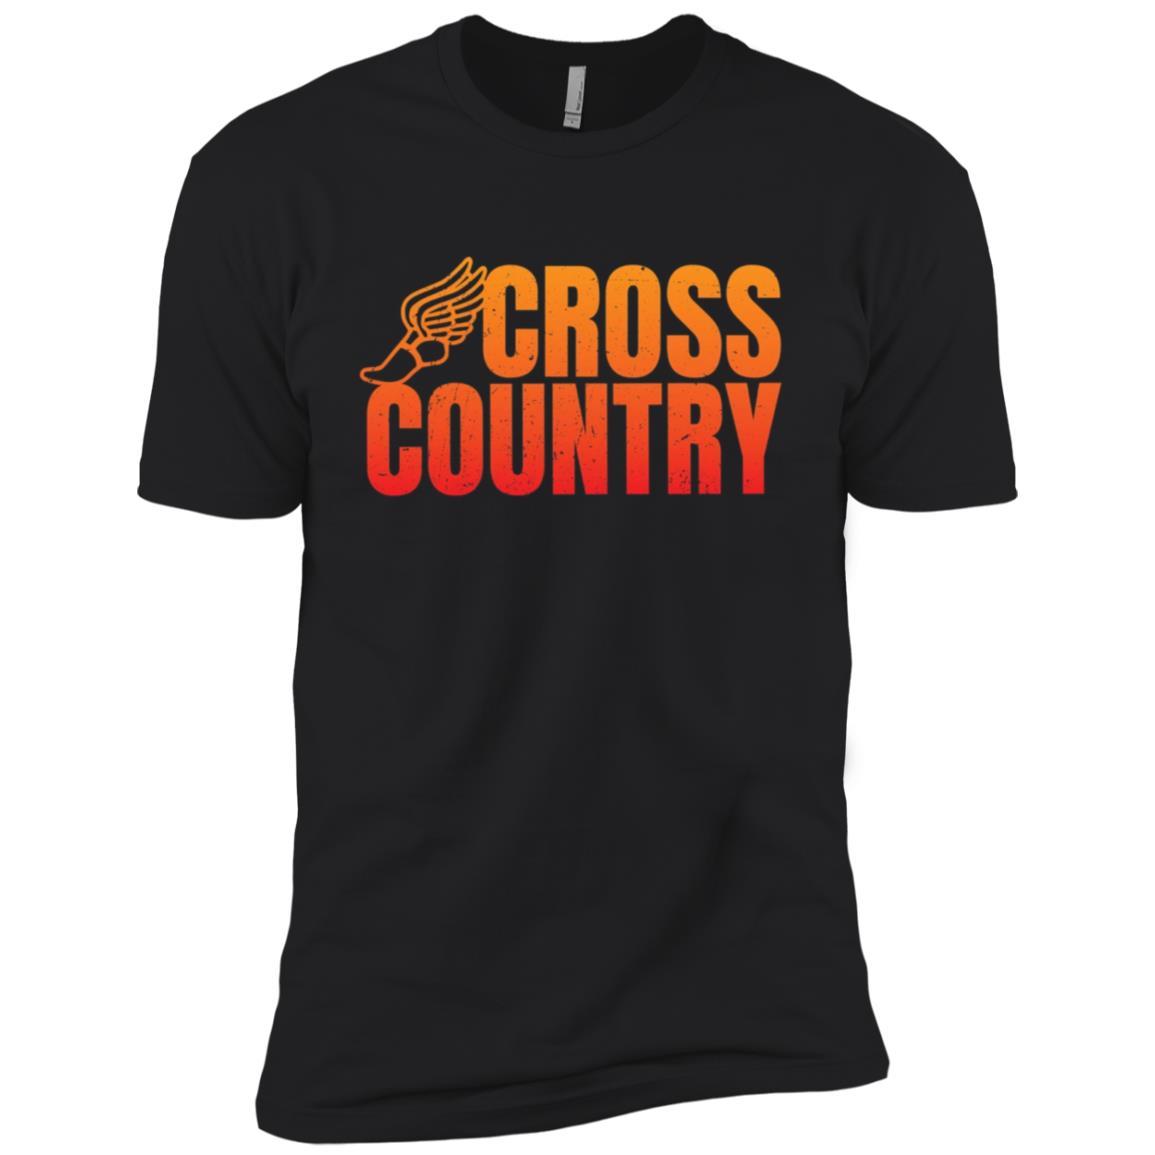 Cool Funny Cross Country Running Gift for Runners Men Short Sleeve T-Shirt